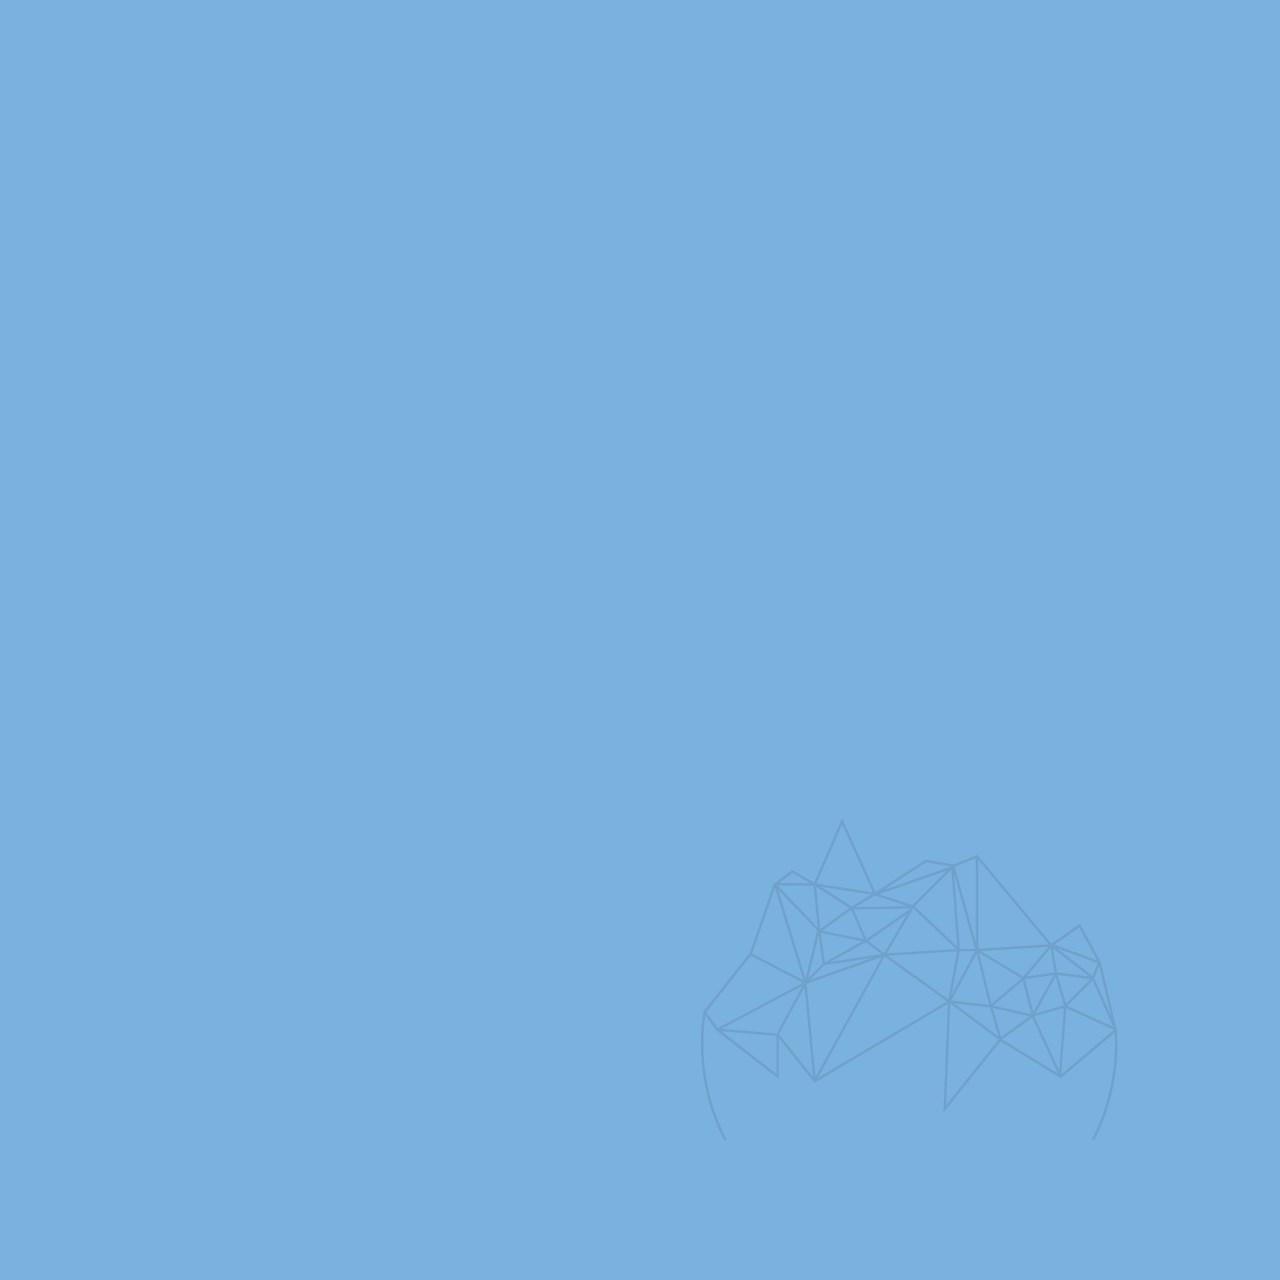 Weber Color Perfect Sky 2 KG - Flexible wall & floor grout title=Weber Color Perfect Sky 2 KG - Flexible wall & floor grout